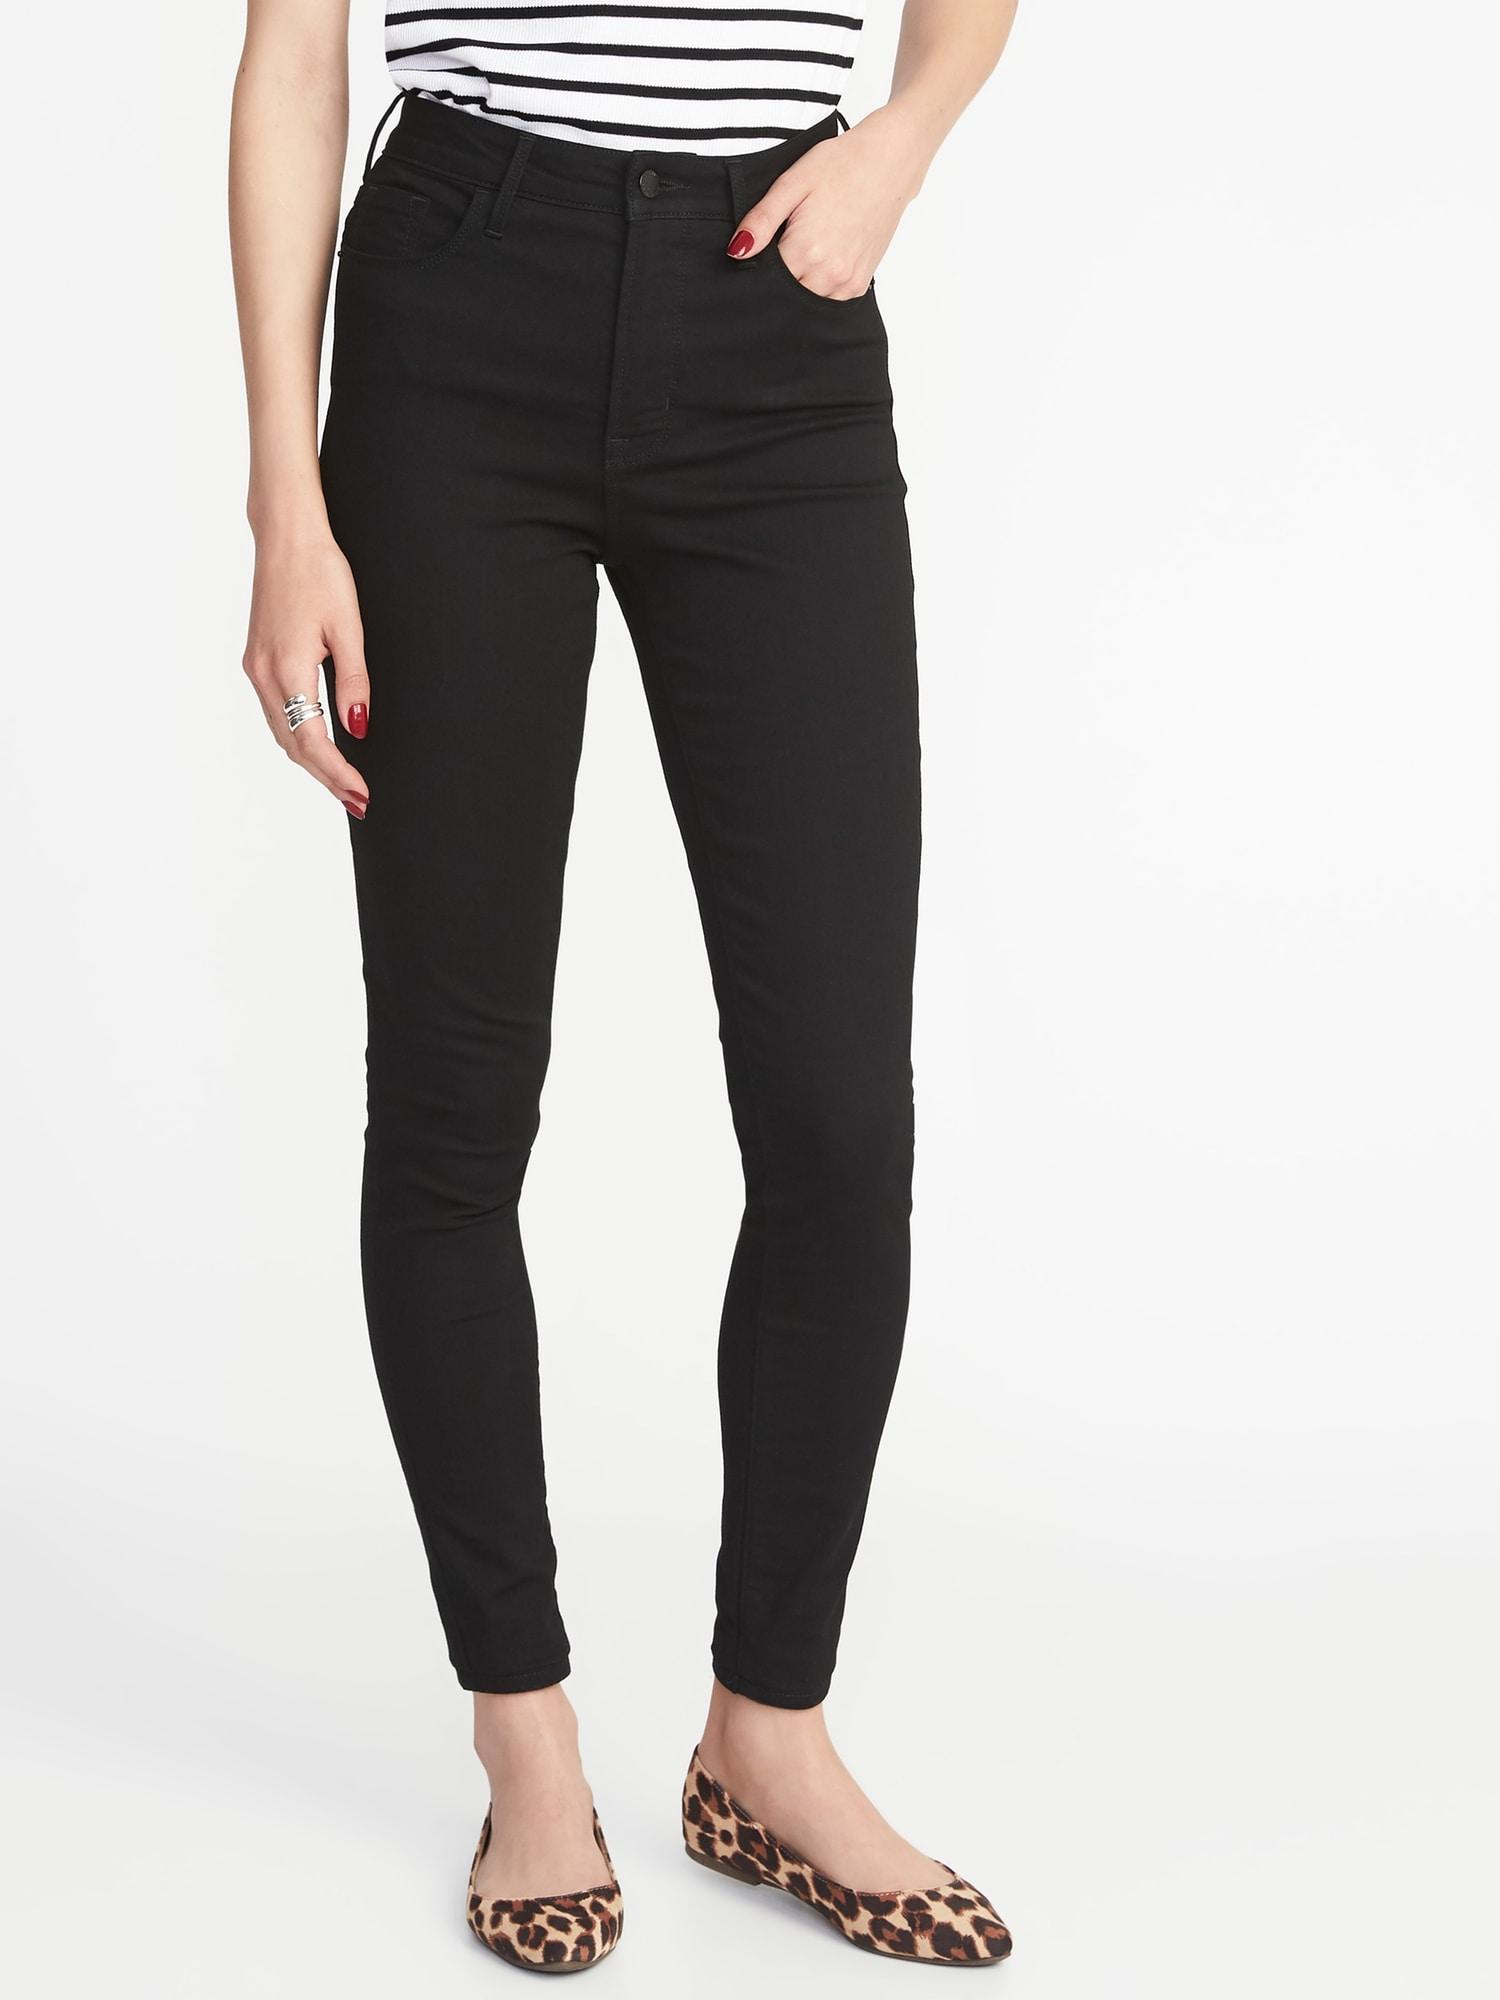 2d078e40e5c88 High-Rise Secret-Slim Pockets Rockstar Jeans for Women